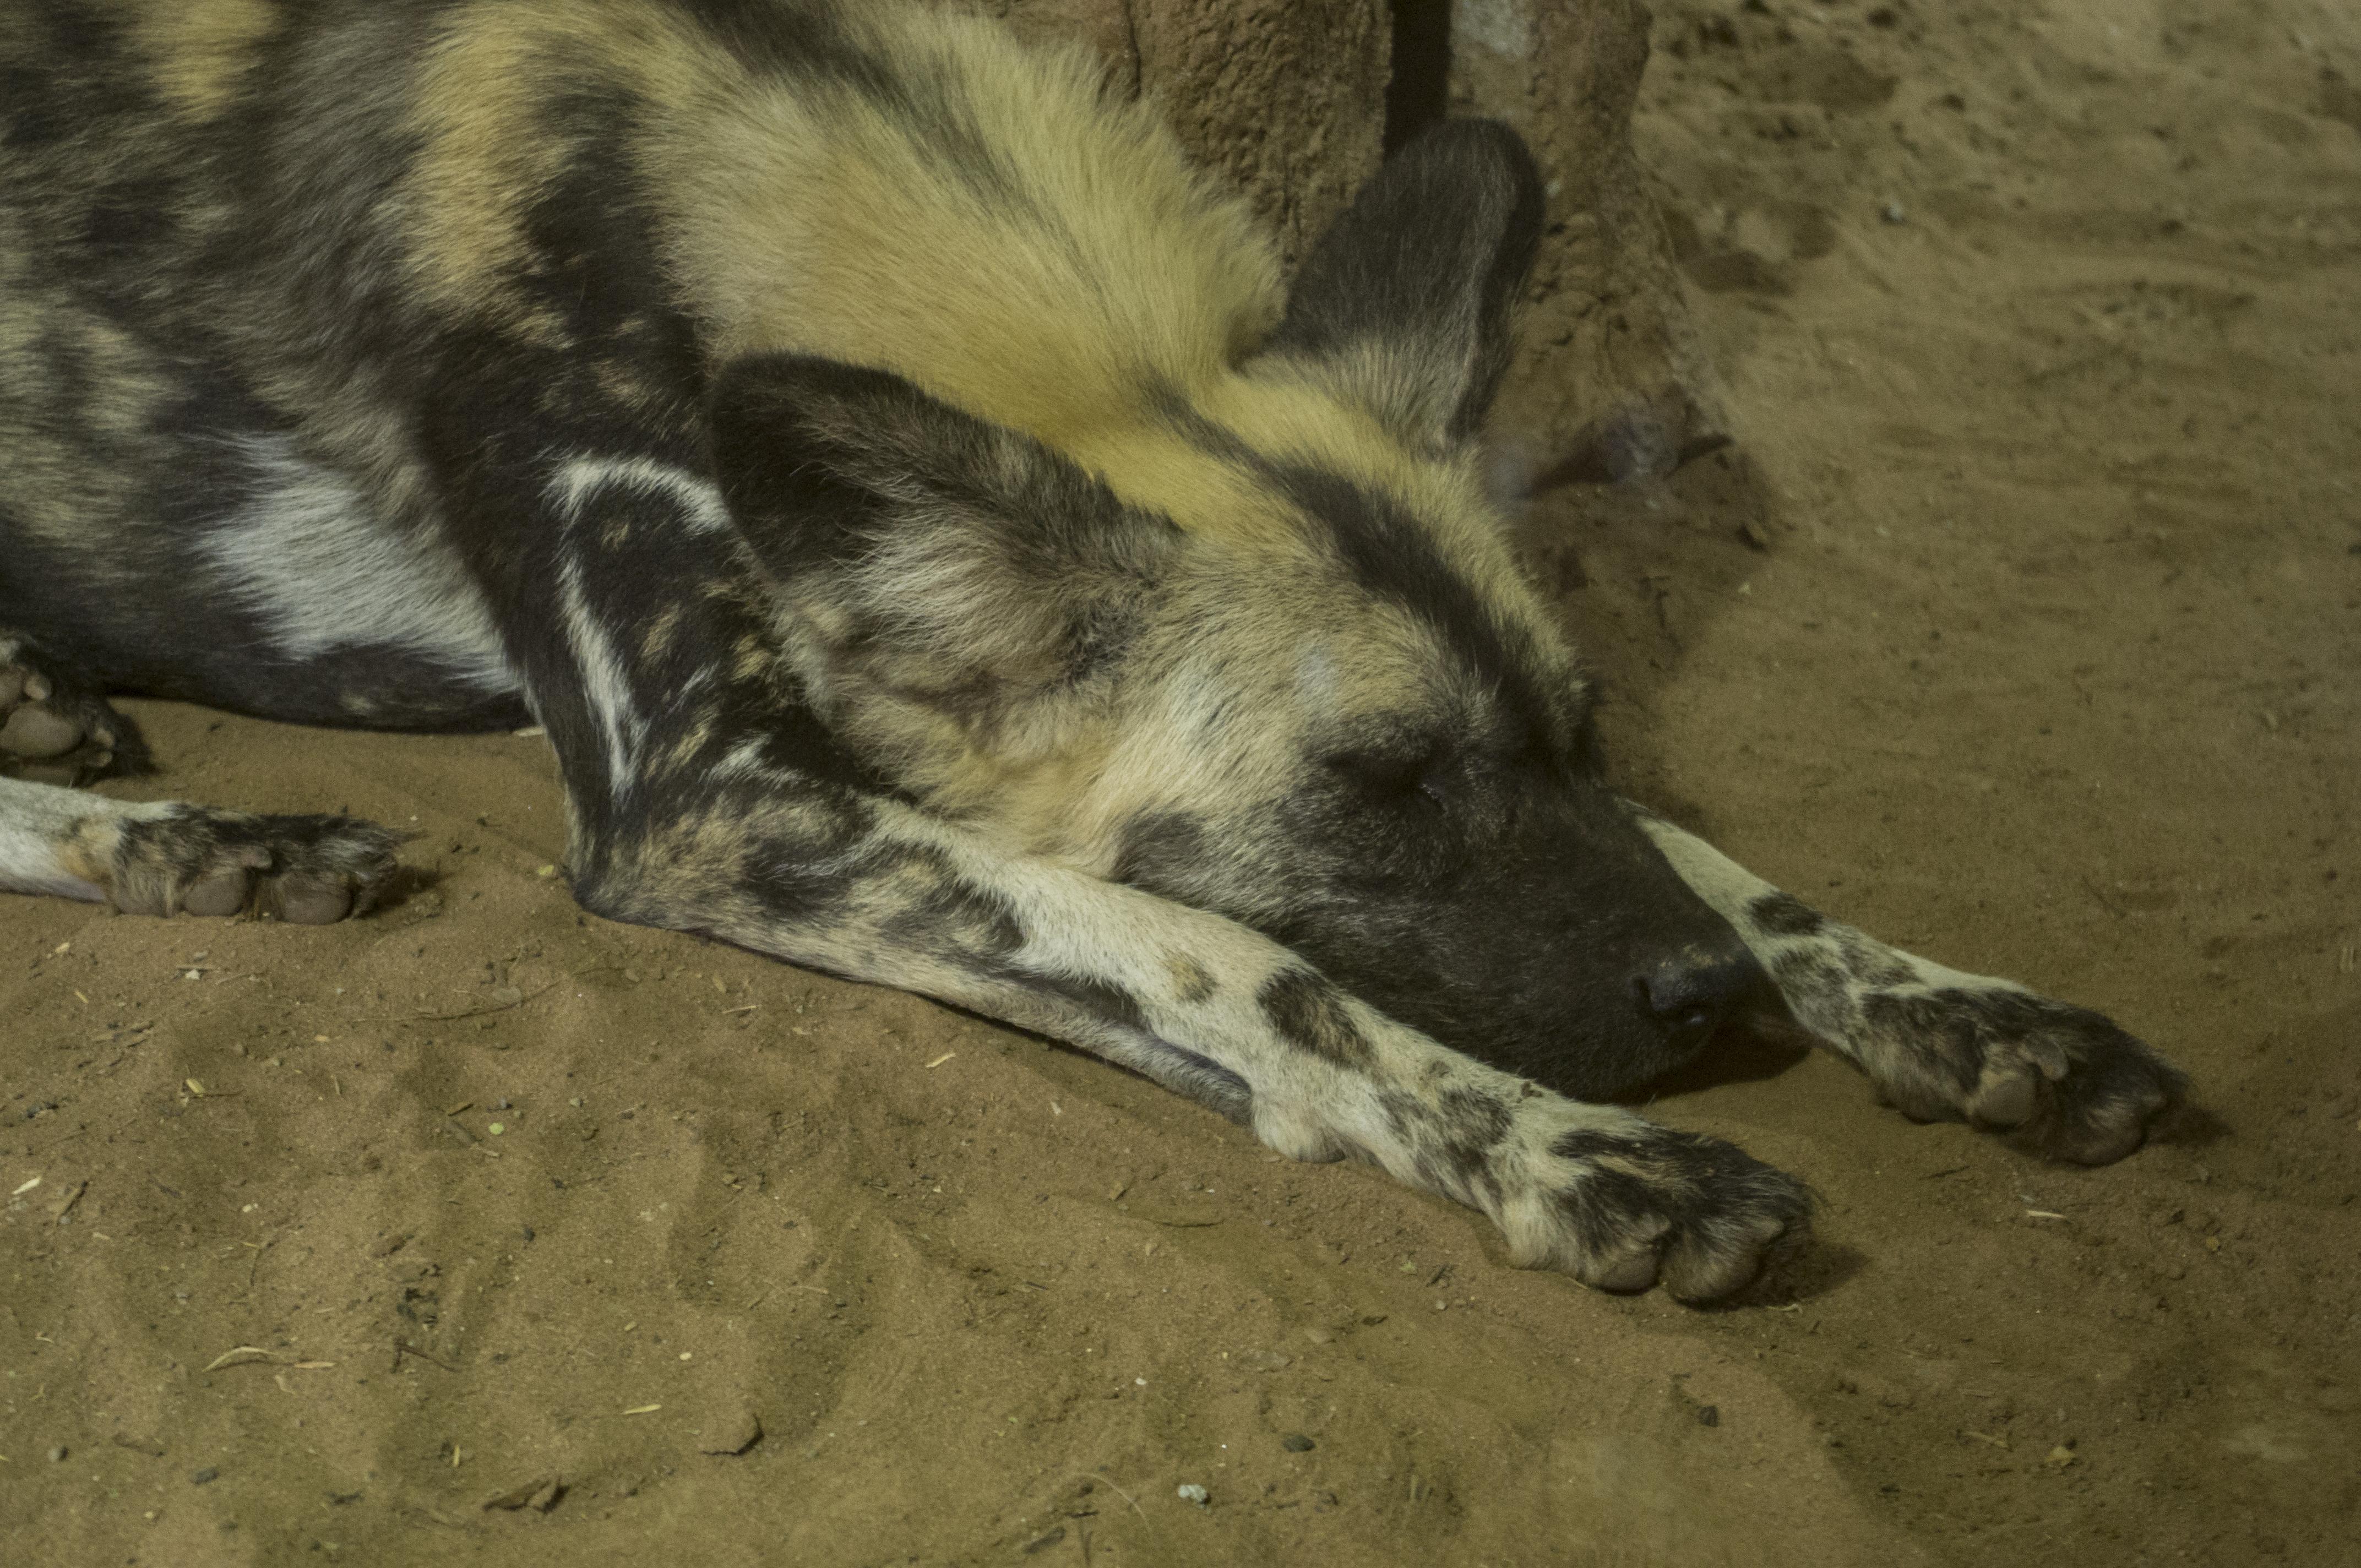 sleeping_ornate_wolf_by_zeealex-d7zqlqq.